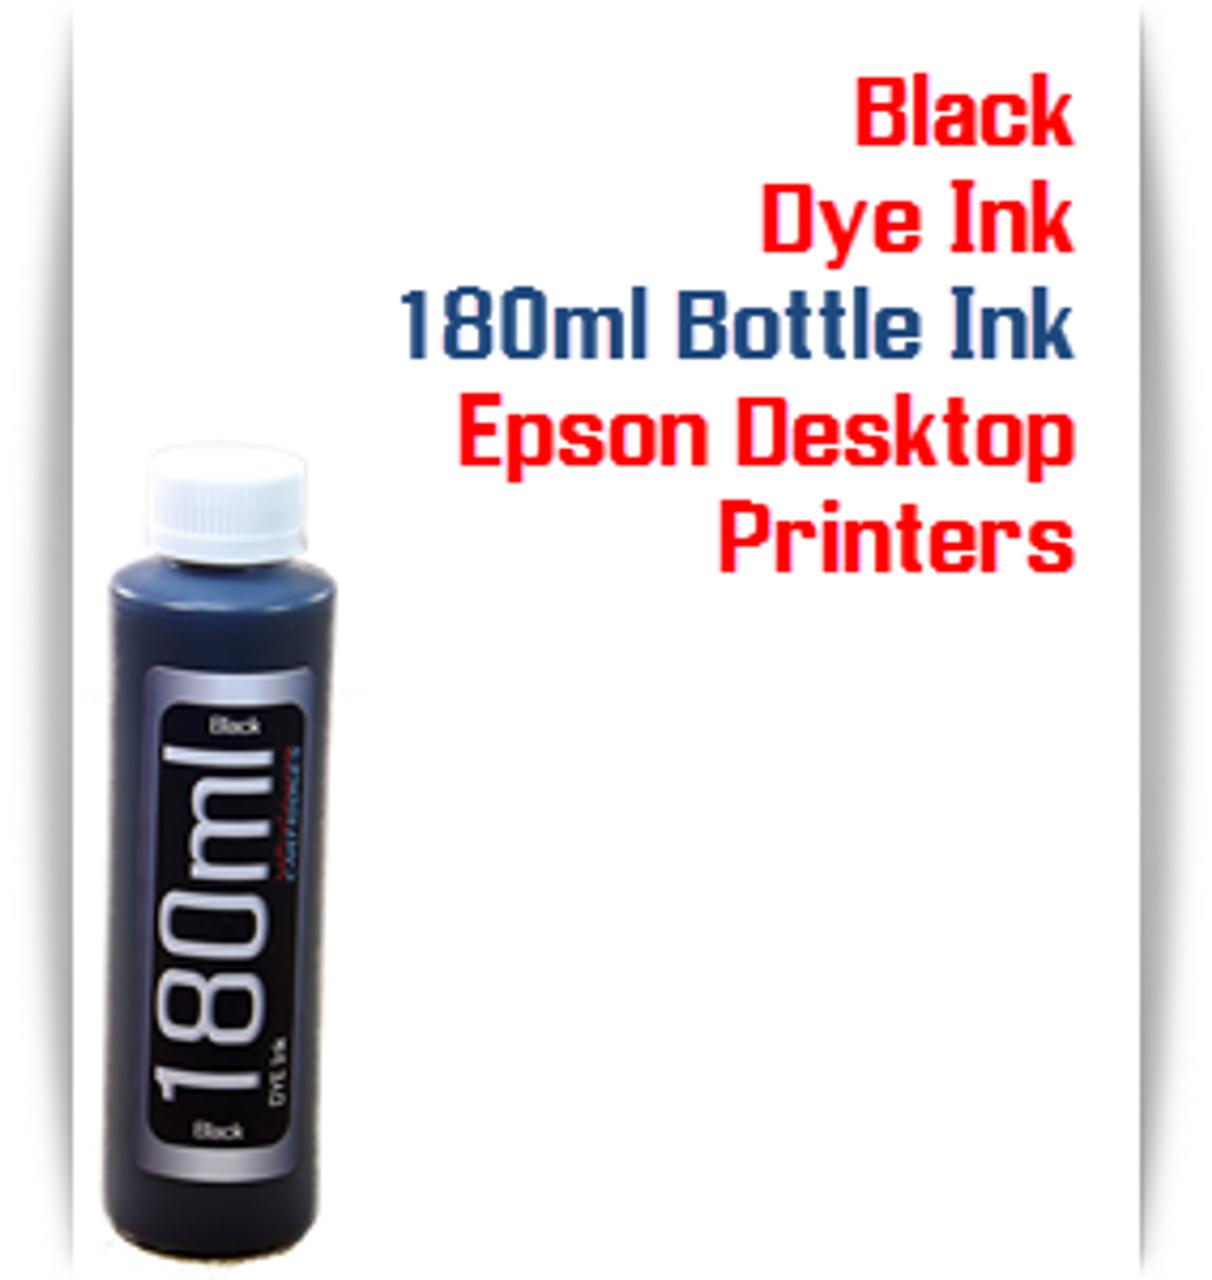 Black 180ml Bottle Dye Ink for Epson Small all in one Desktop Printers